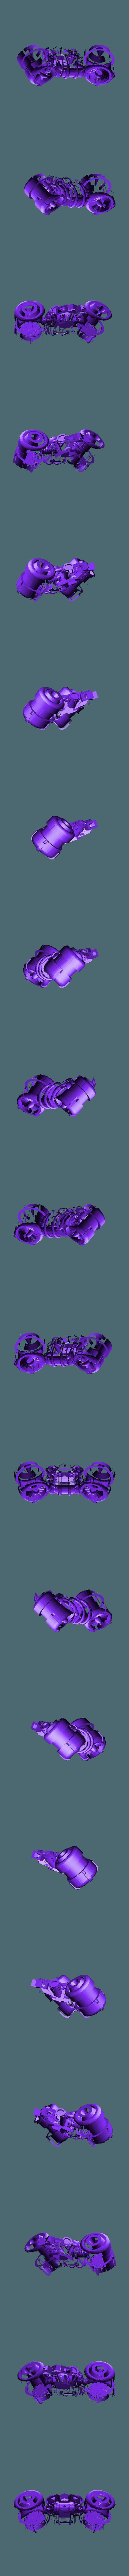 Marine_5_Jet_Pack.stl Download free STL file Assault Marine Builder Berserker, Tzaangors, Blade Cabal • 3D printable template, Mazer